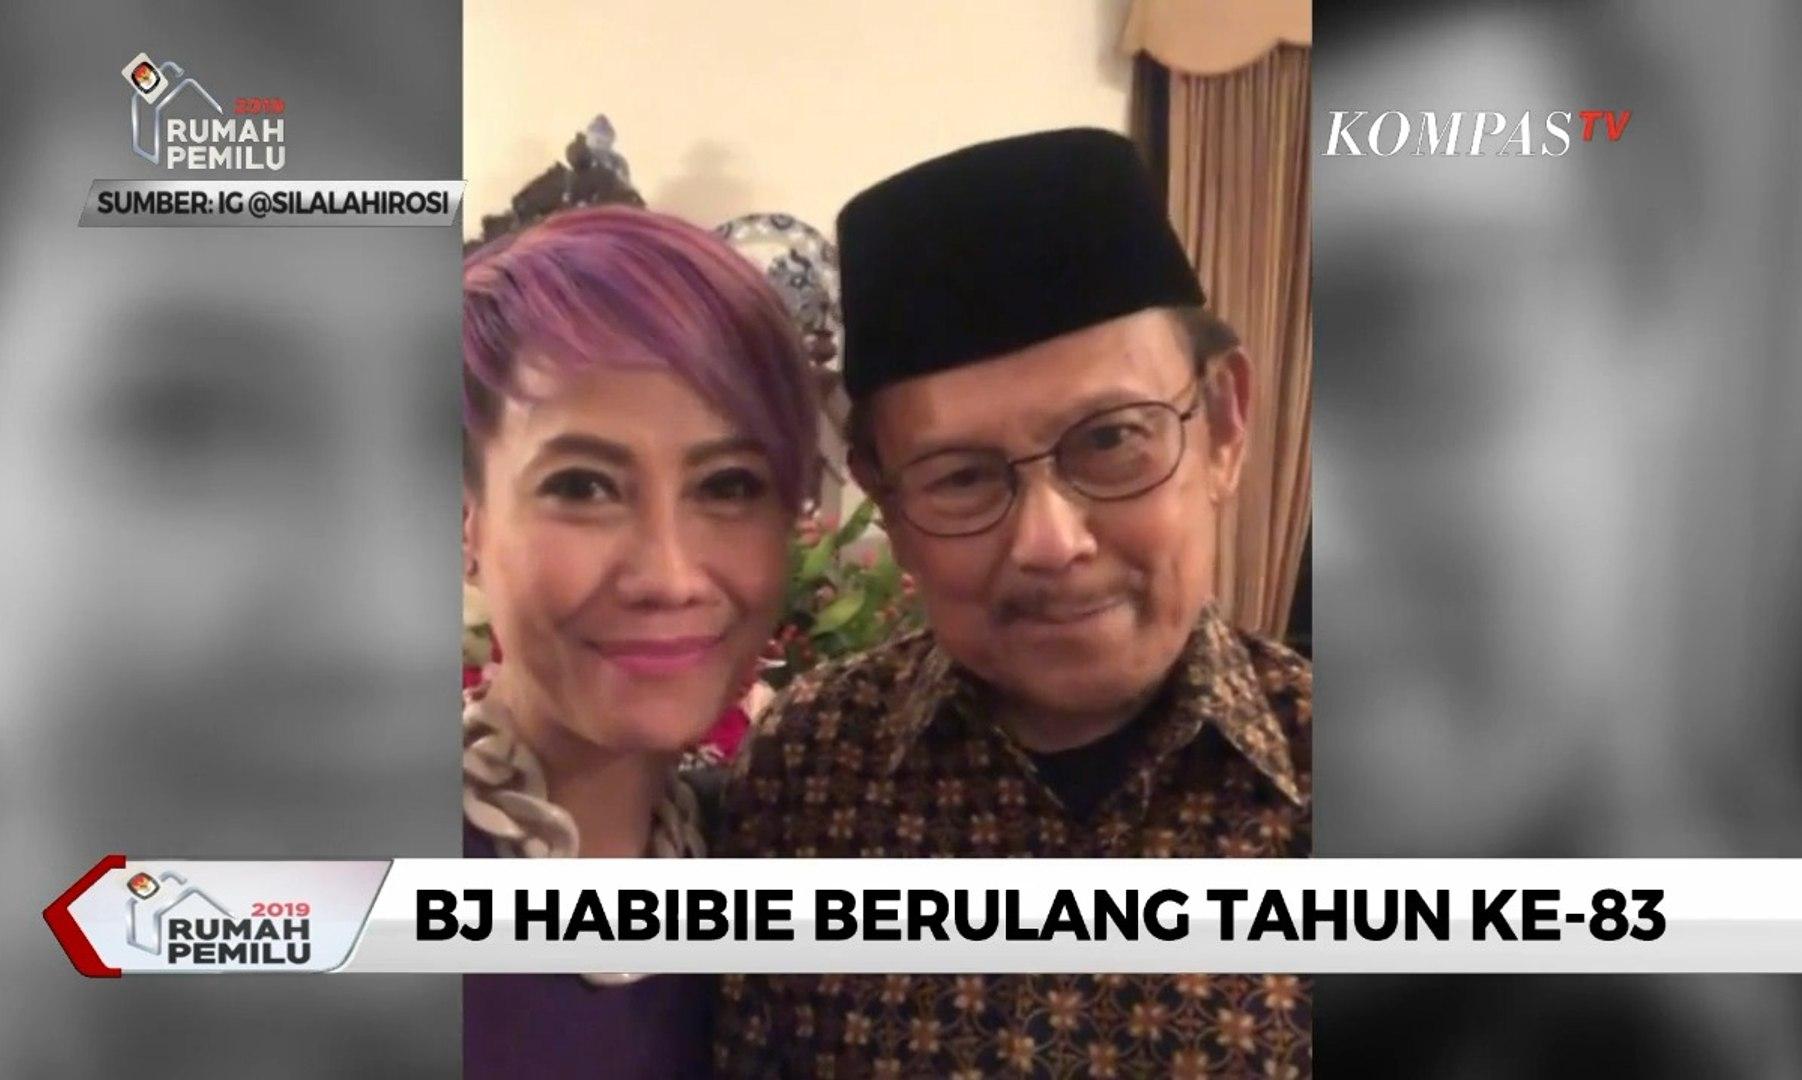 BJ Habibie Berulang Tahun Ke 83 Berbagai Kalangan Beri Ucapan Selamat